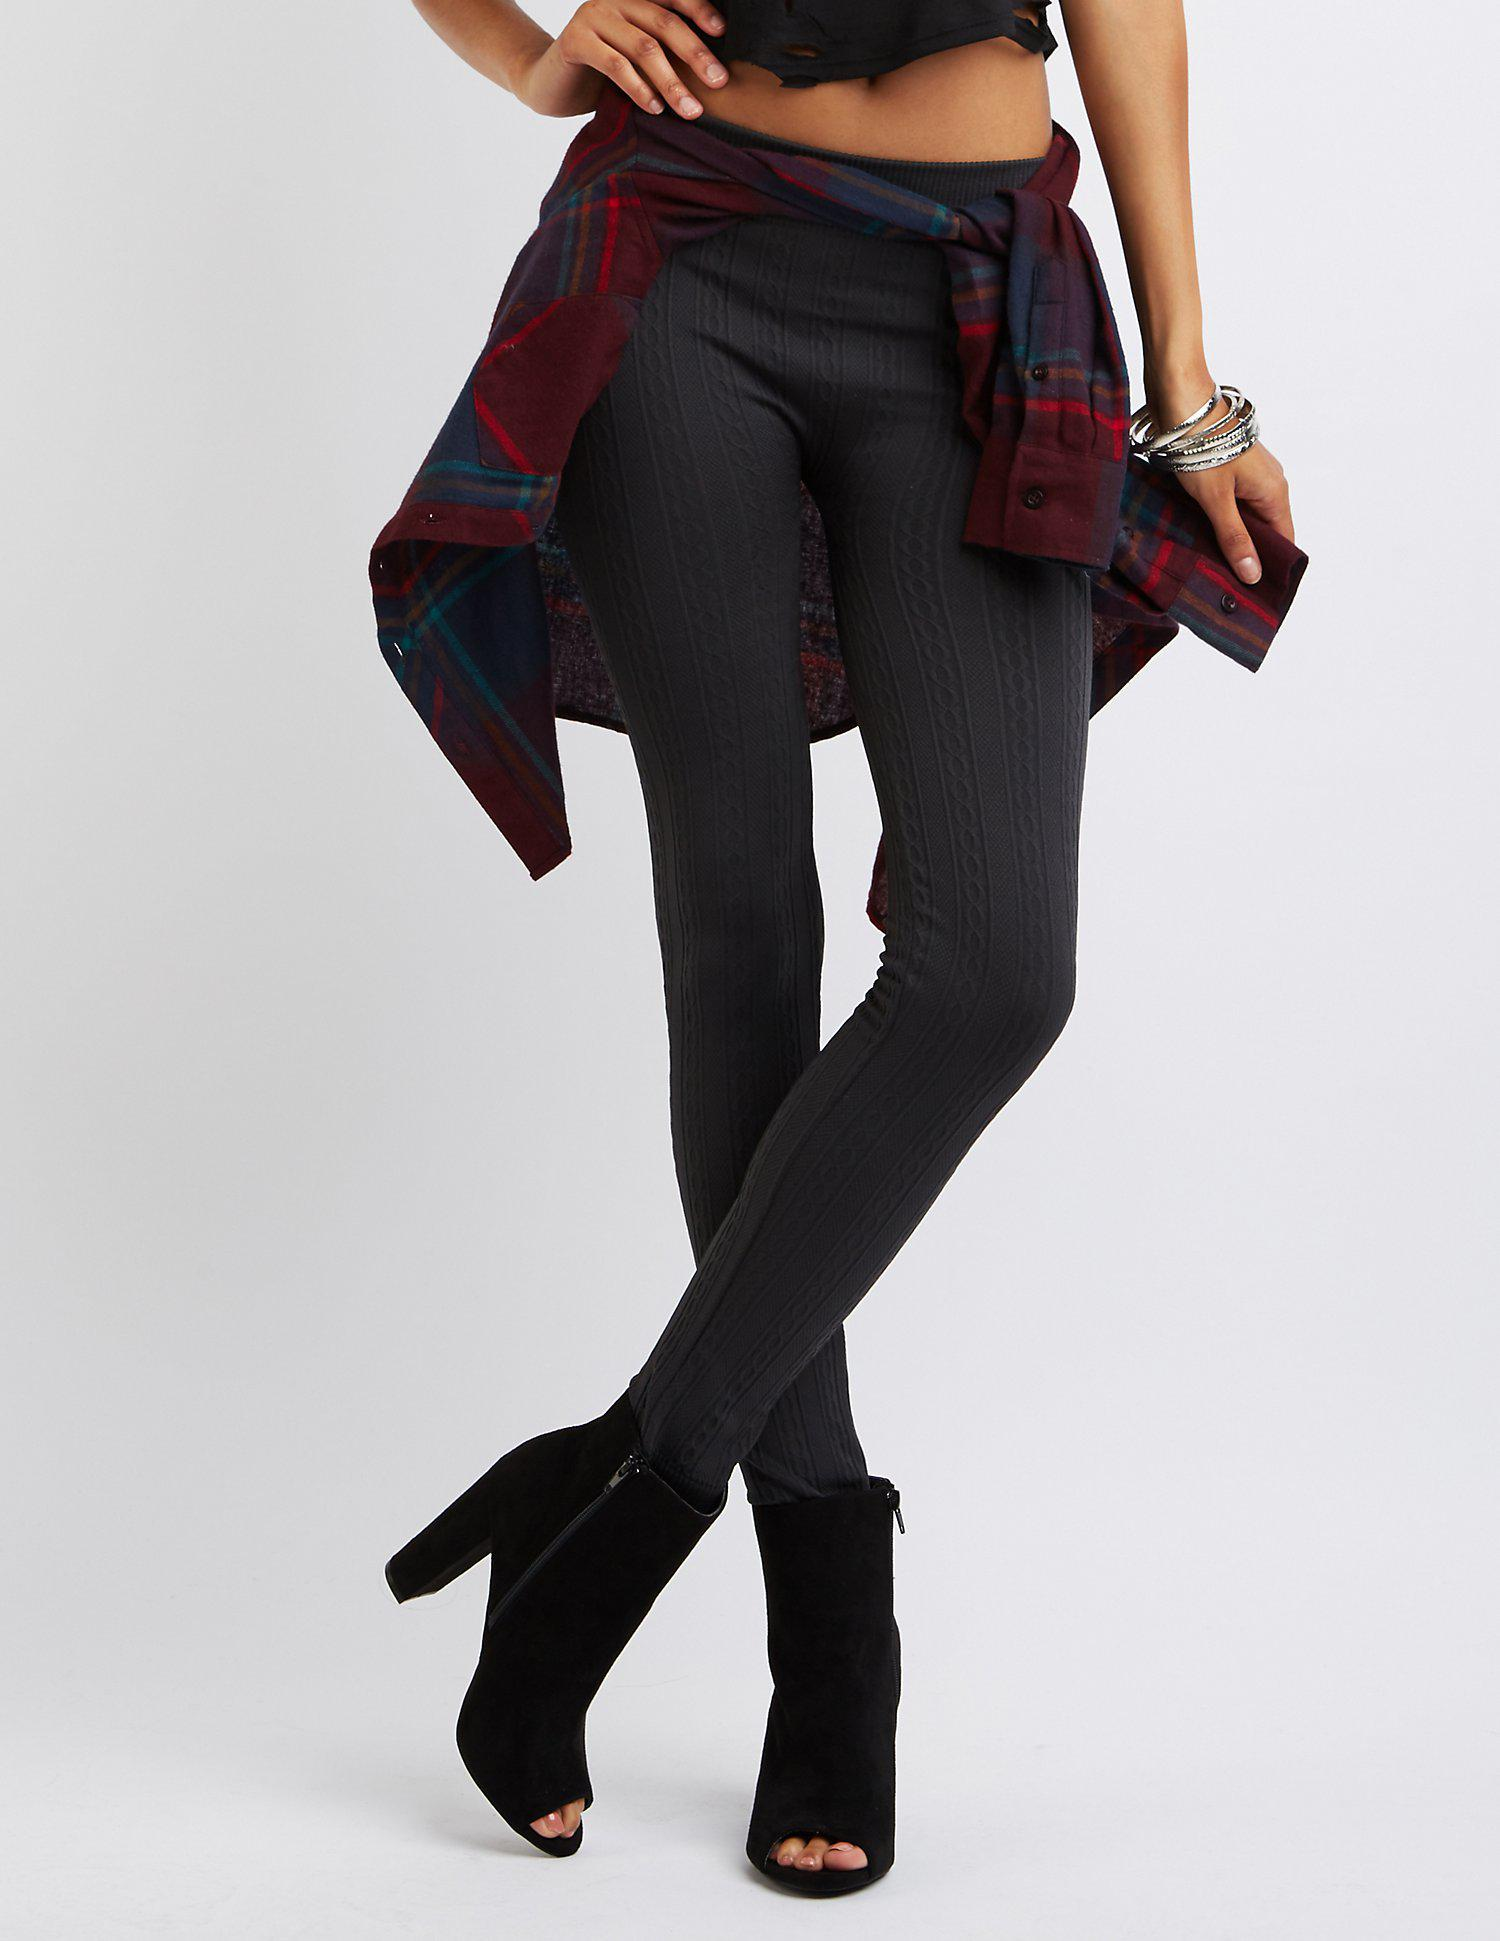 4680c9c108de1e Lyst - Charlotte Russe Fleece Lined Textured Leggings in Gray